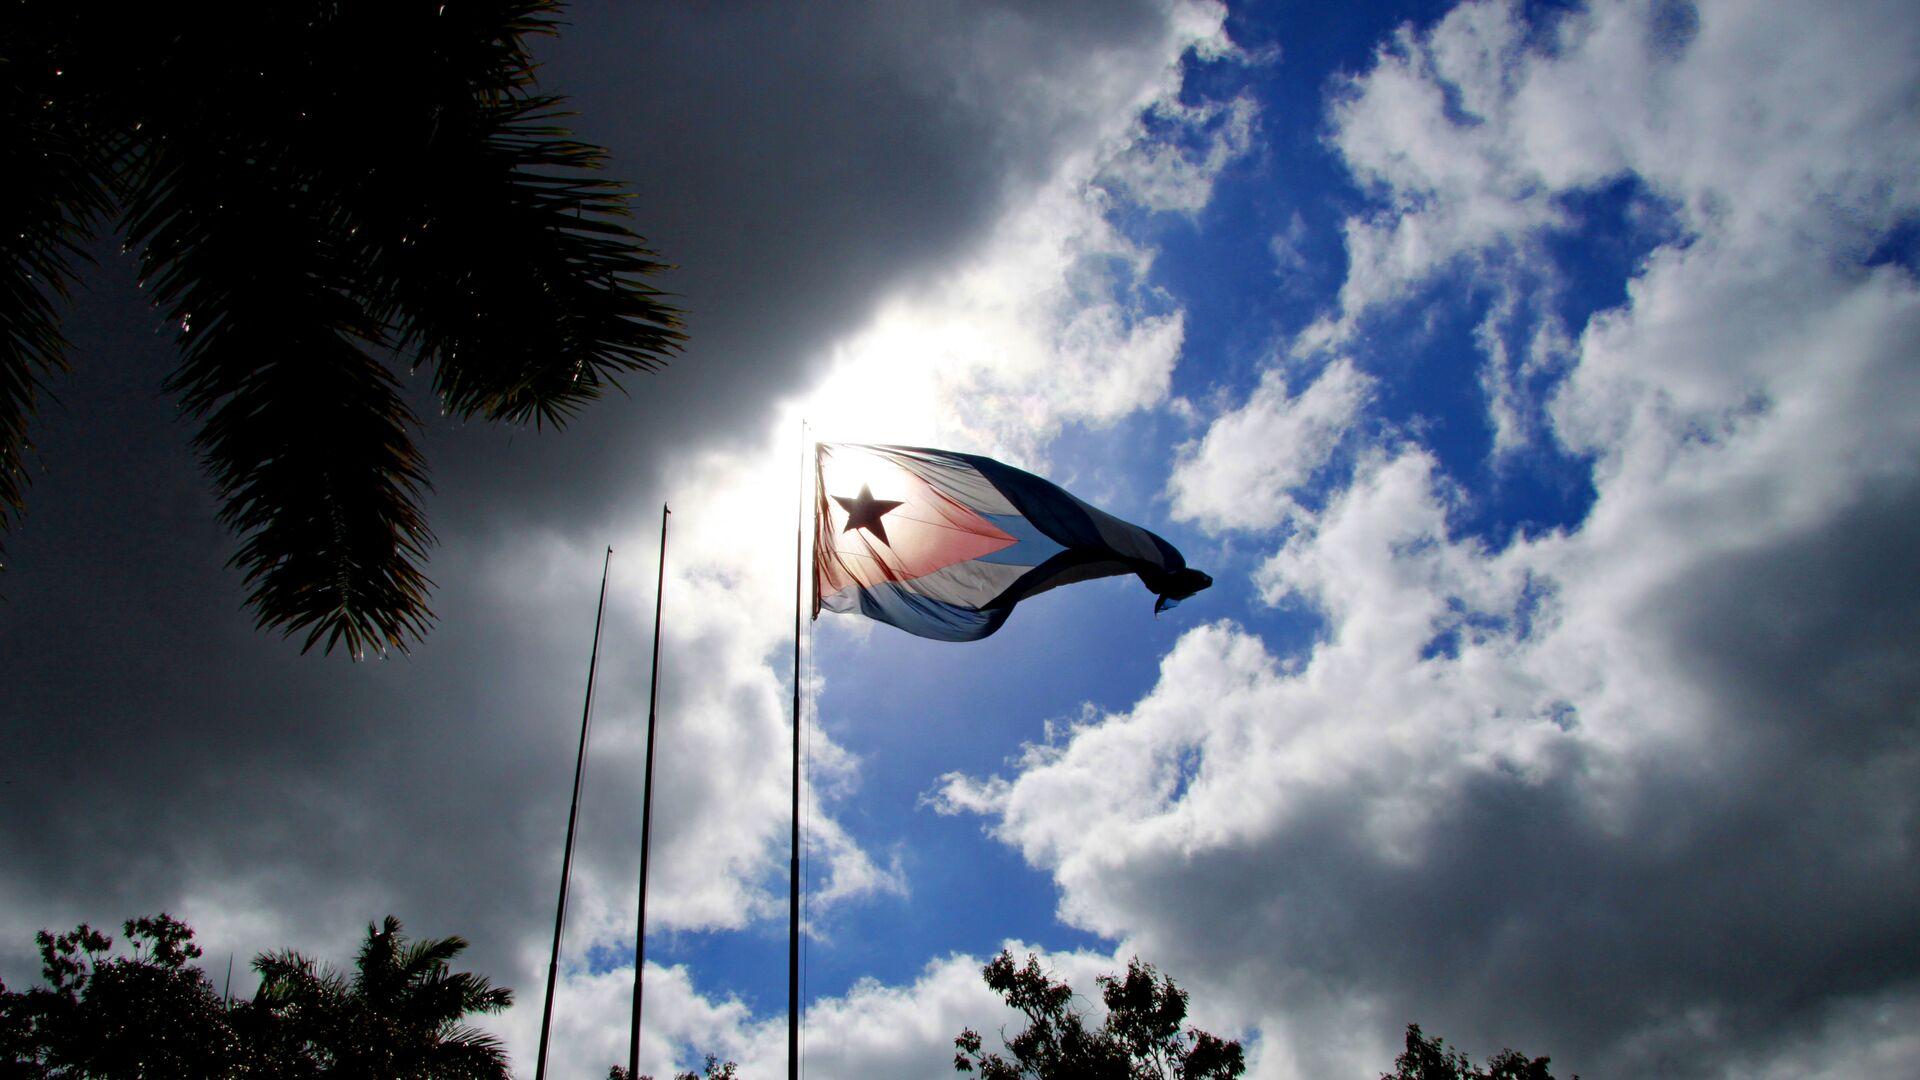 La bandiera cubana - Sputnik Italia, 1920, 31.07.2021